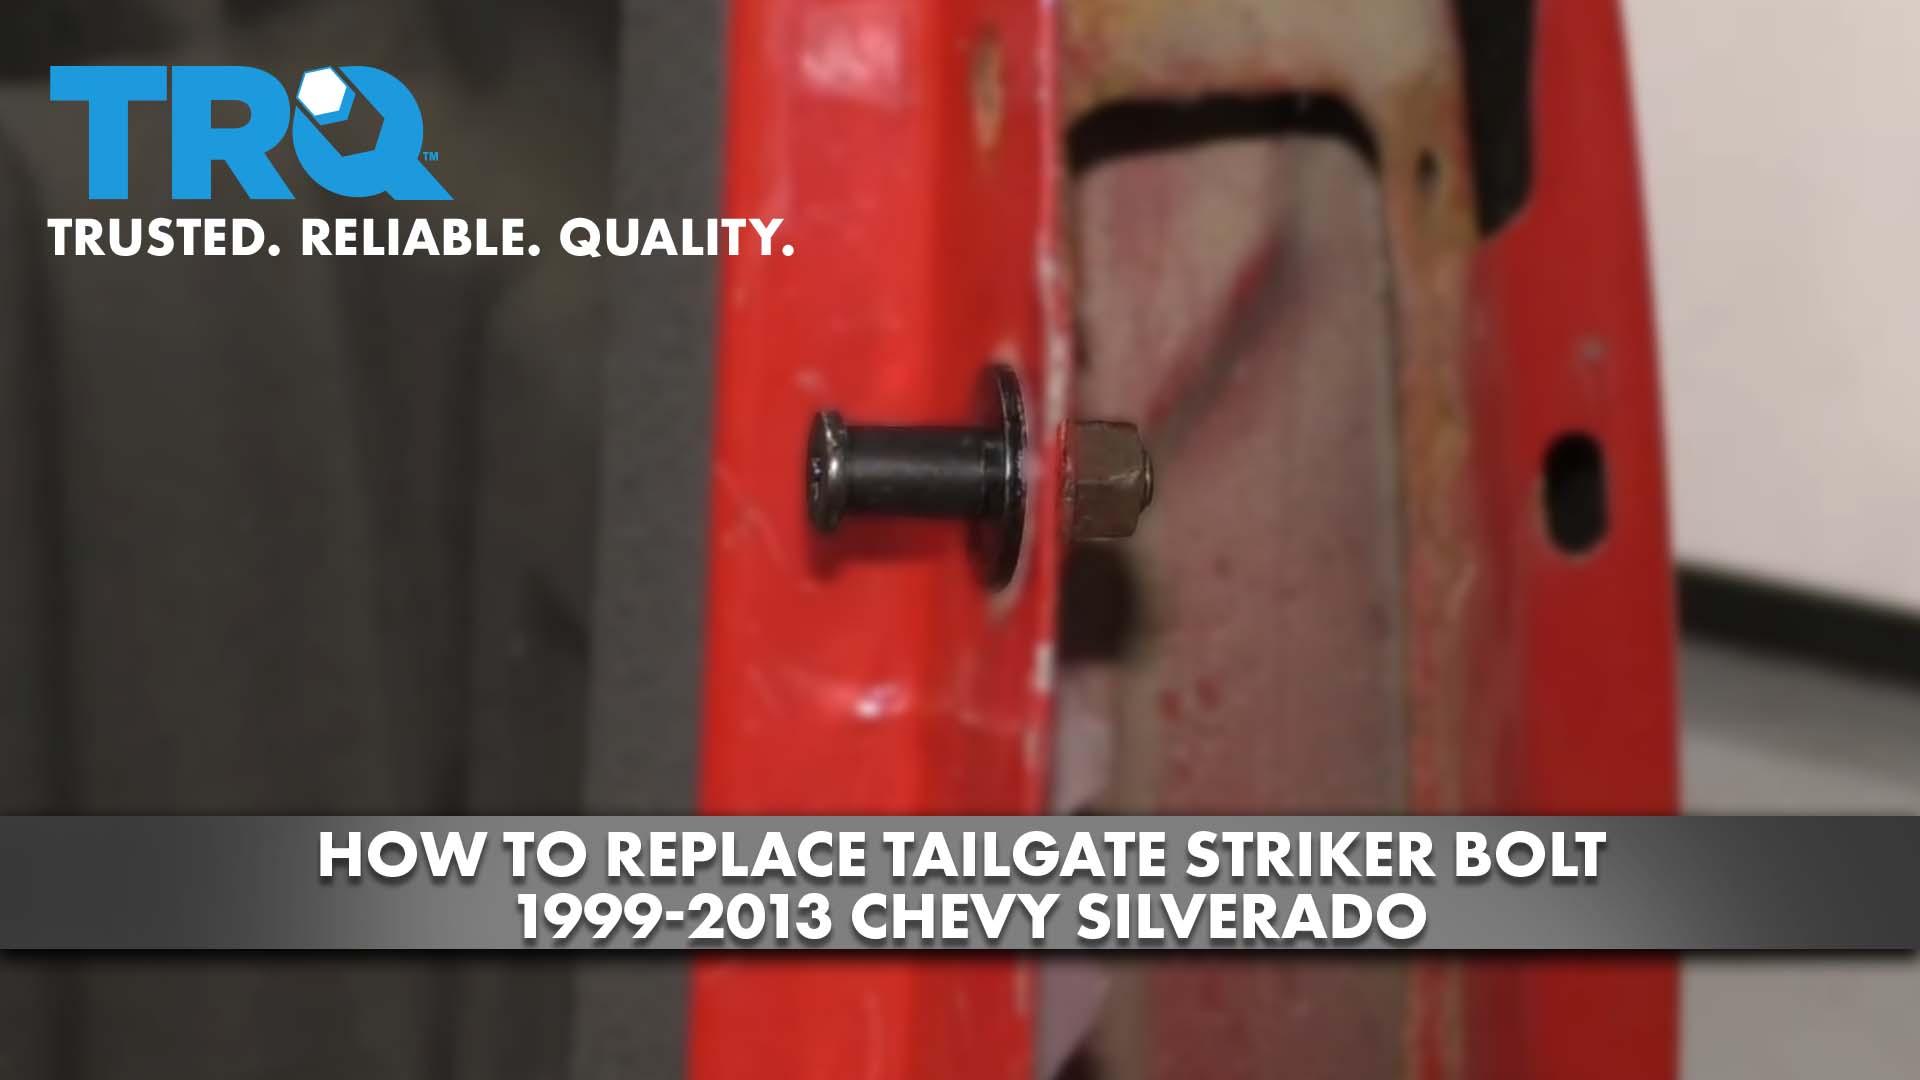 How to Replace Tailgate Striker Bolt 1999-13 Chevy Silverado